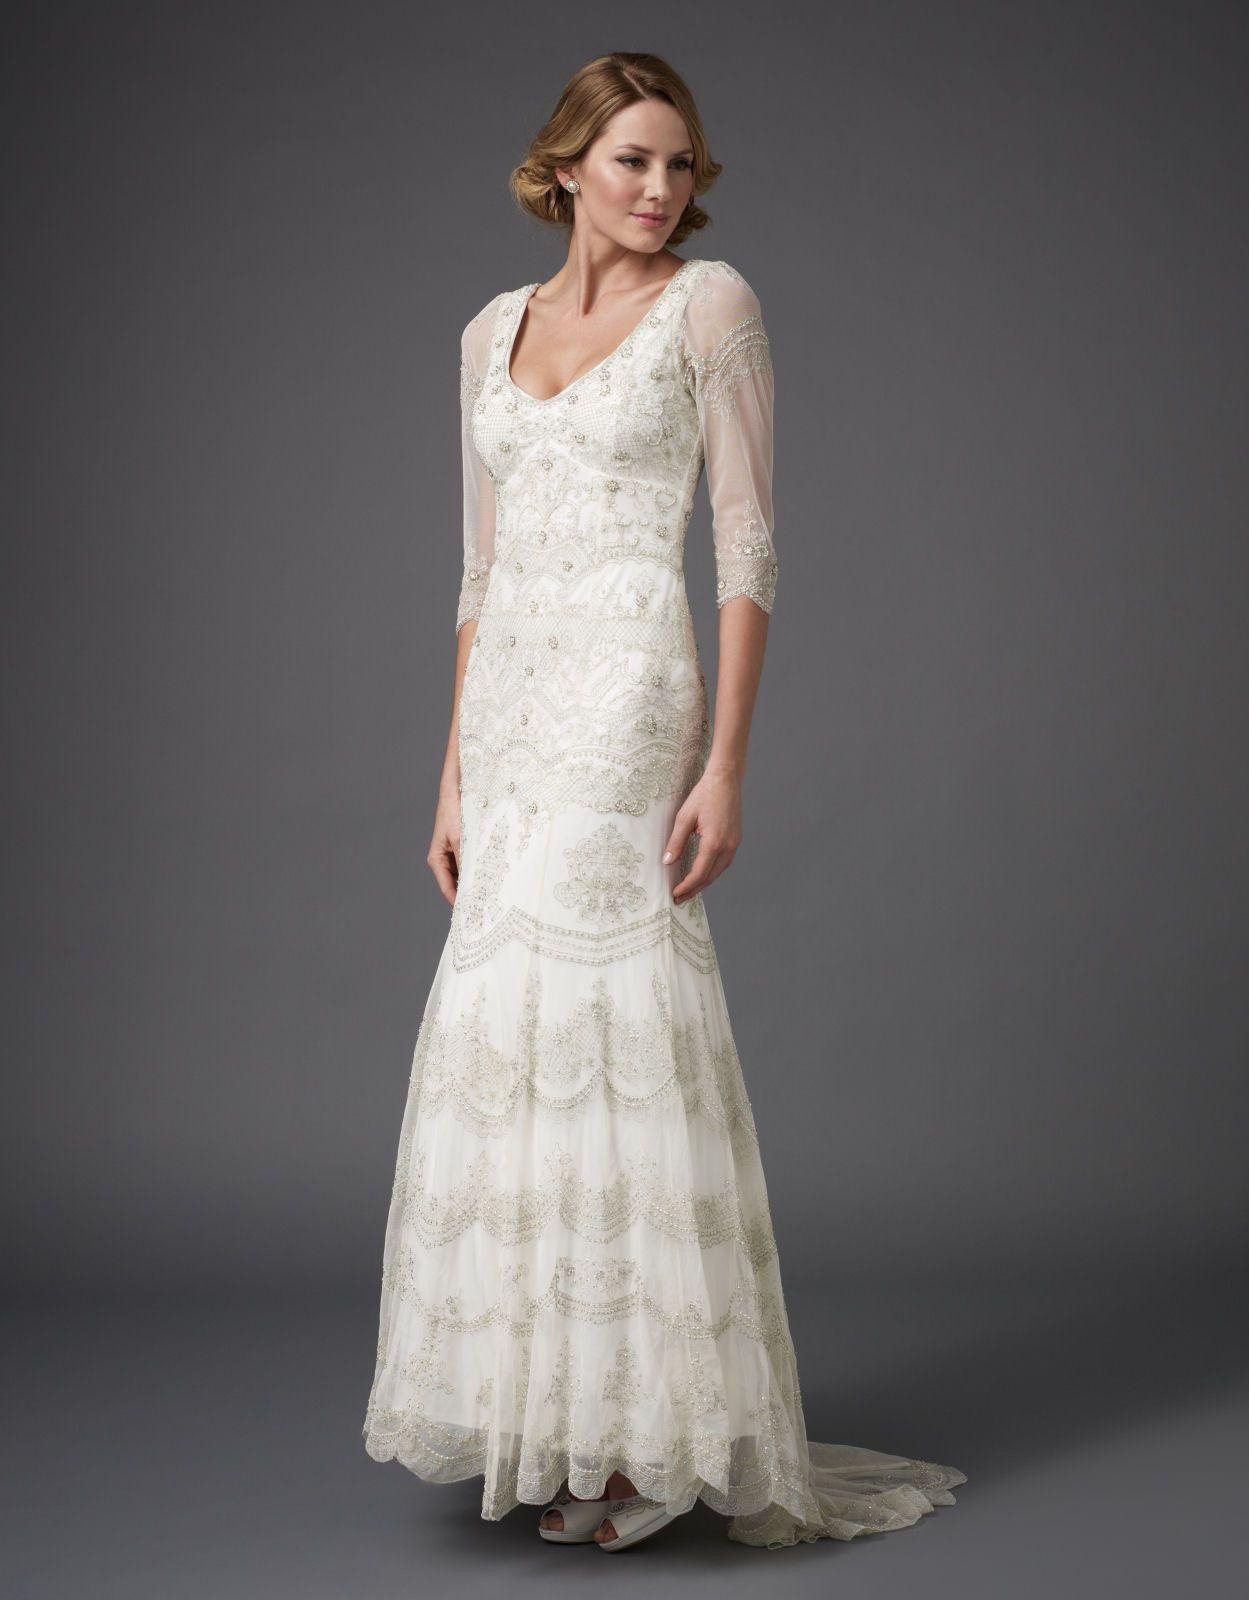 Breya Dress From Monsoon Bridal Embellished Wedding Dress Monsoon Wedding Dresses Stunning Wedding Dresses